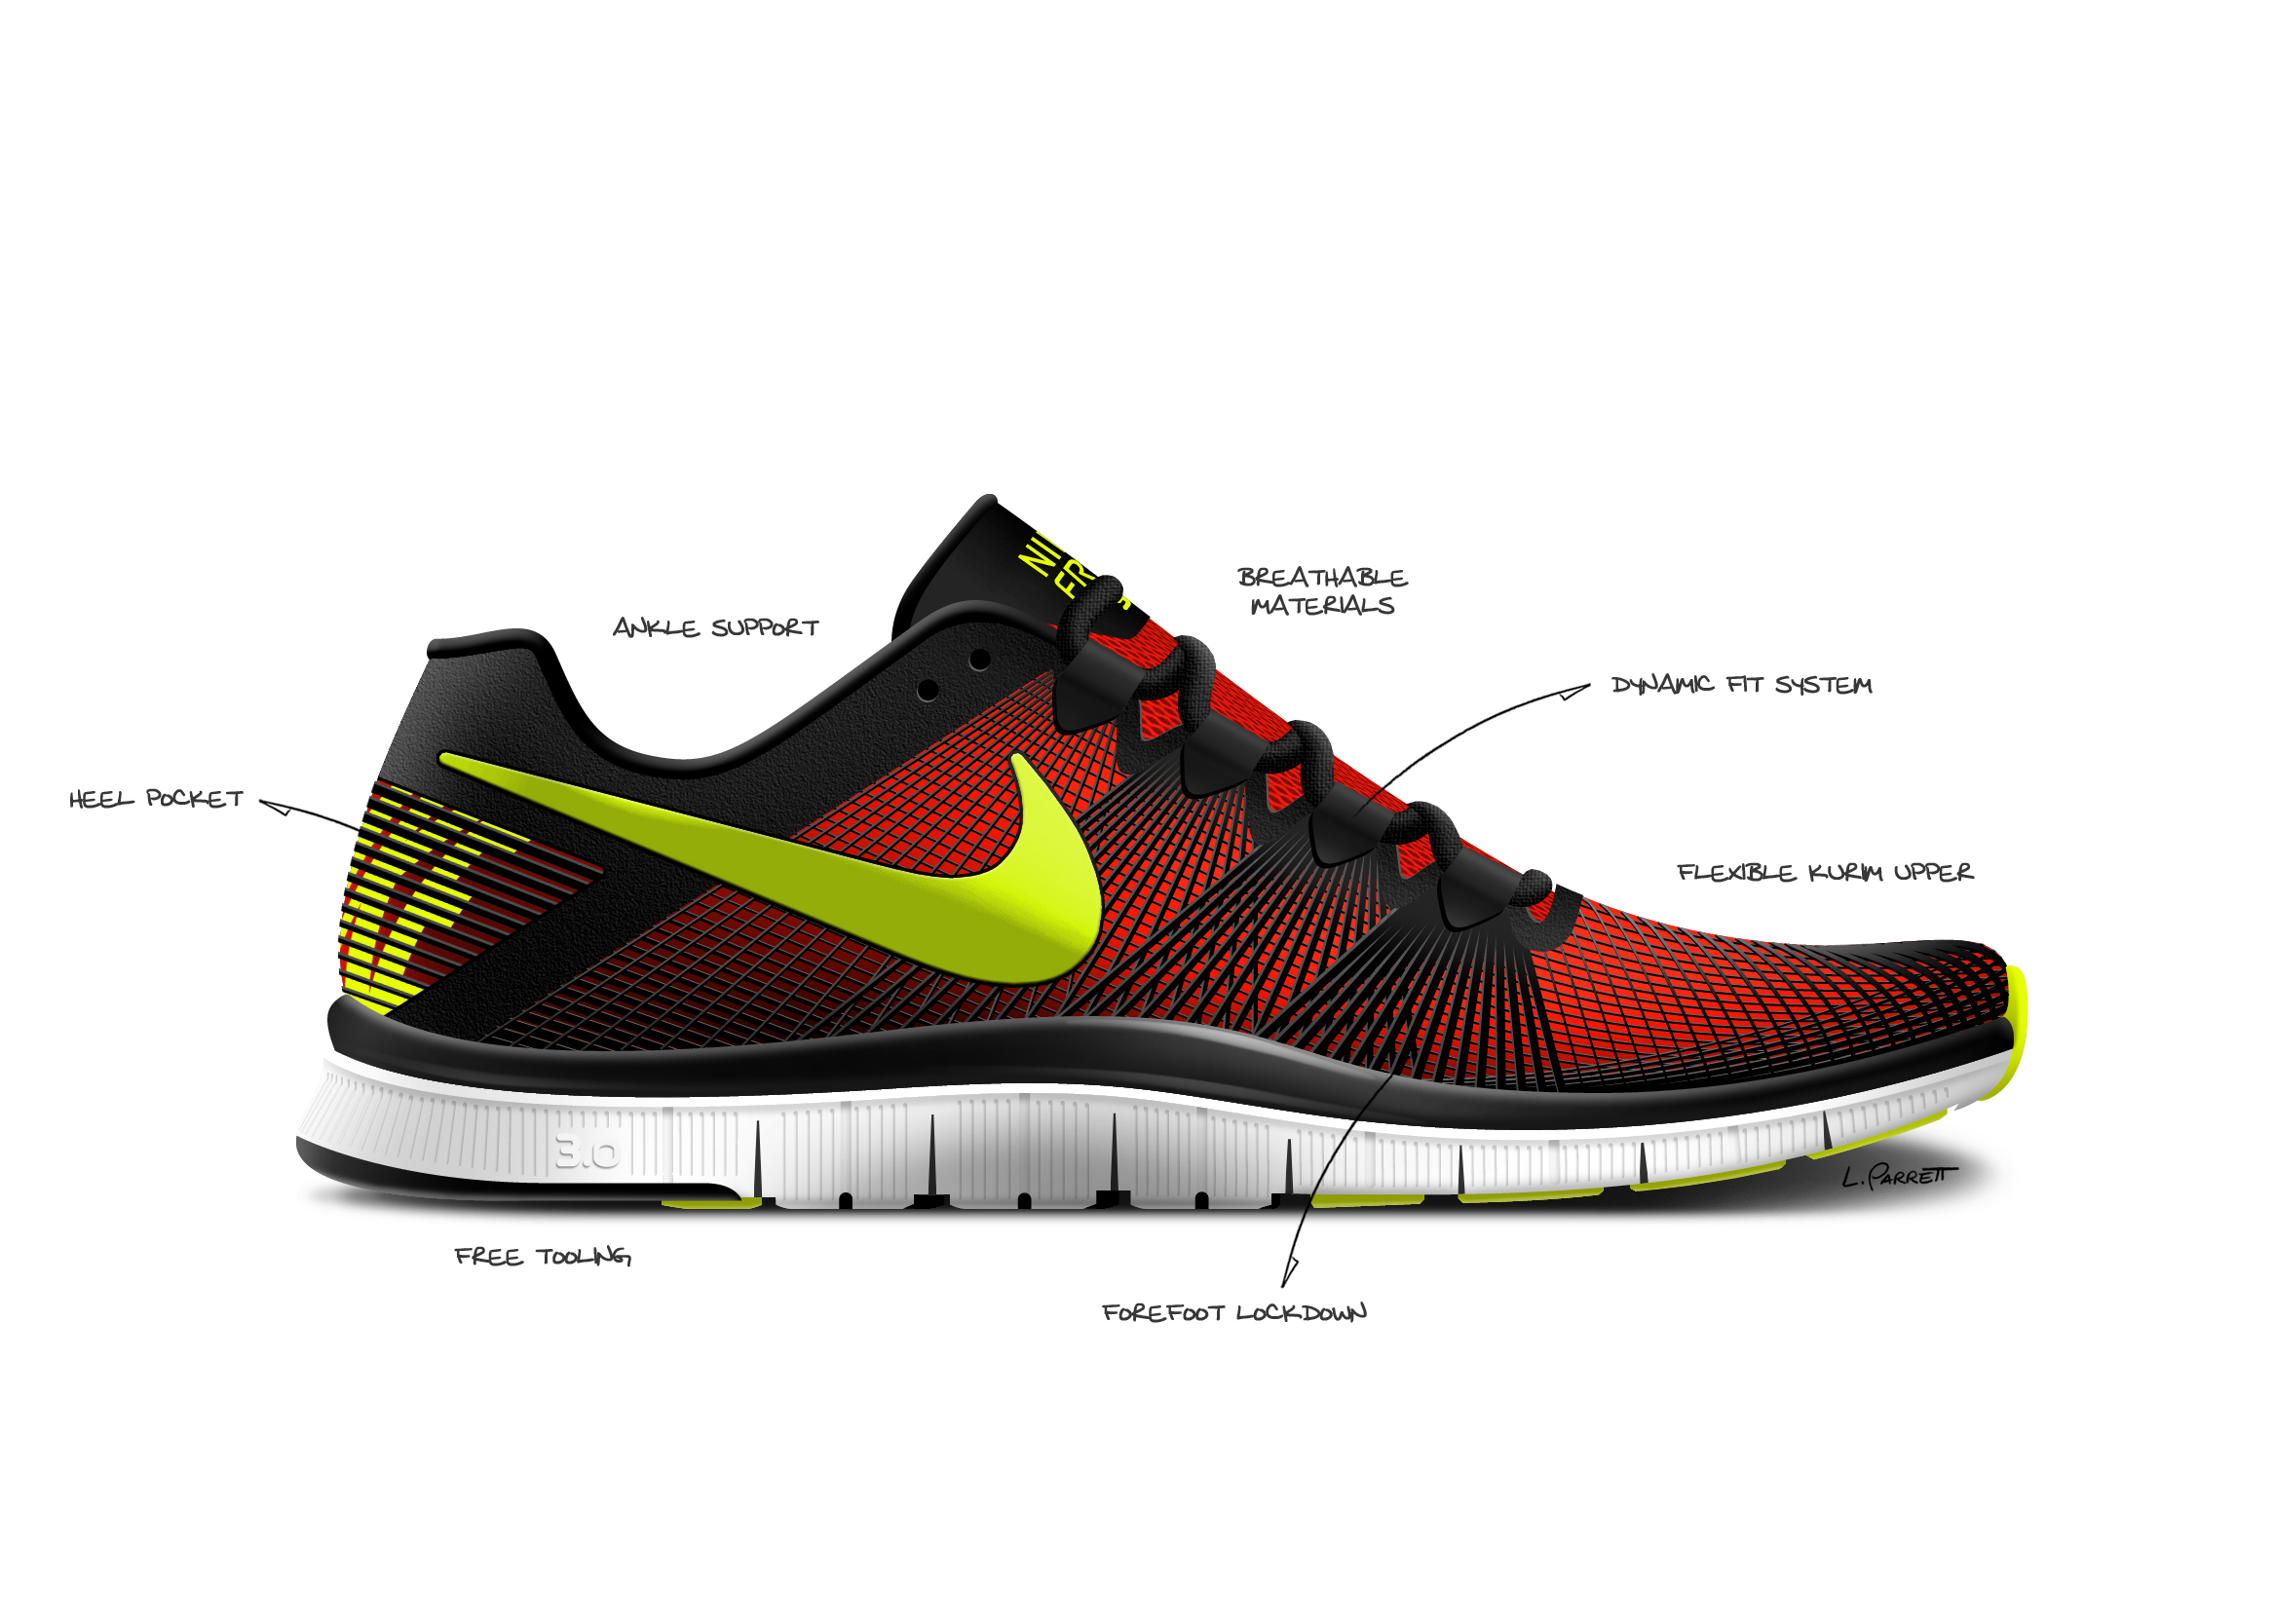 Nike Free 5.0 Bunt